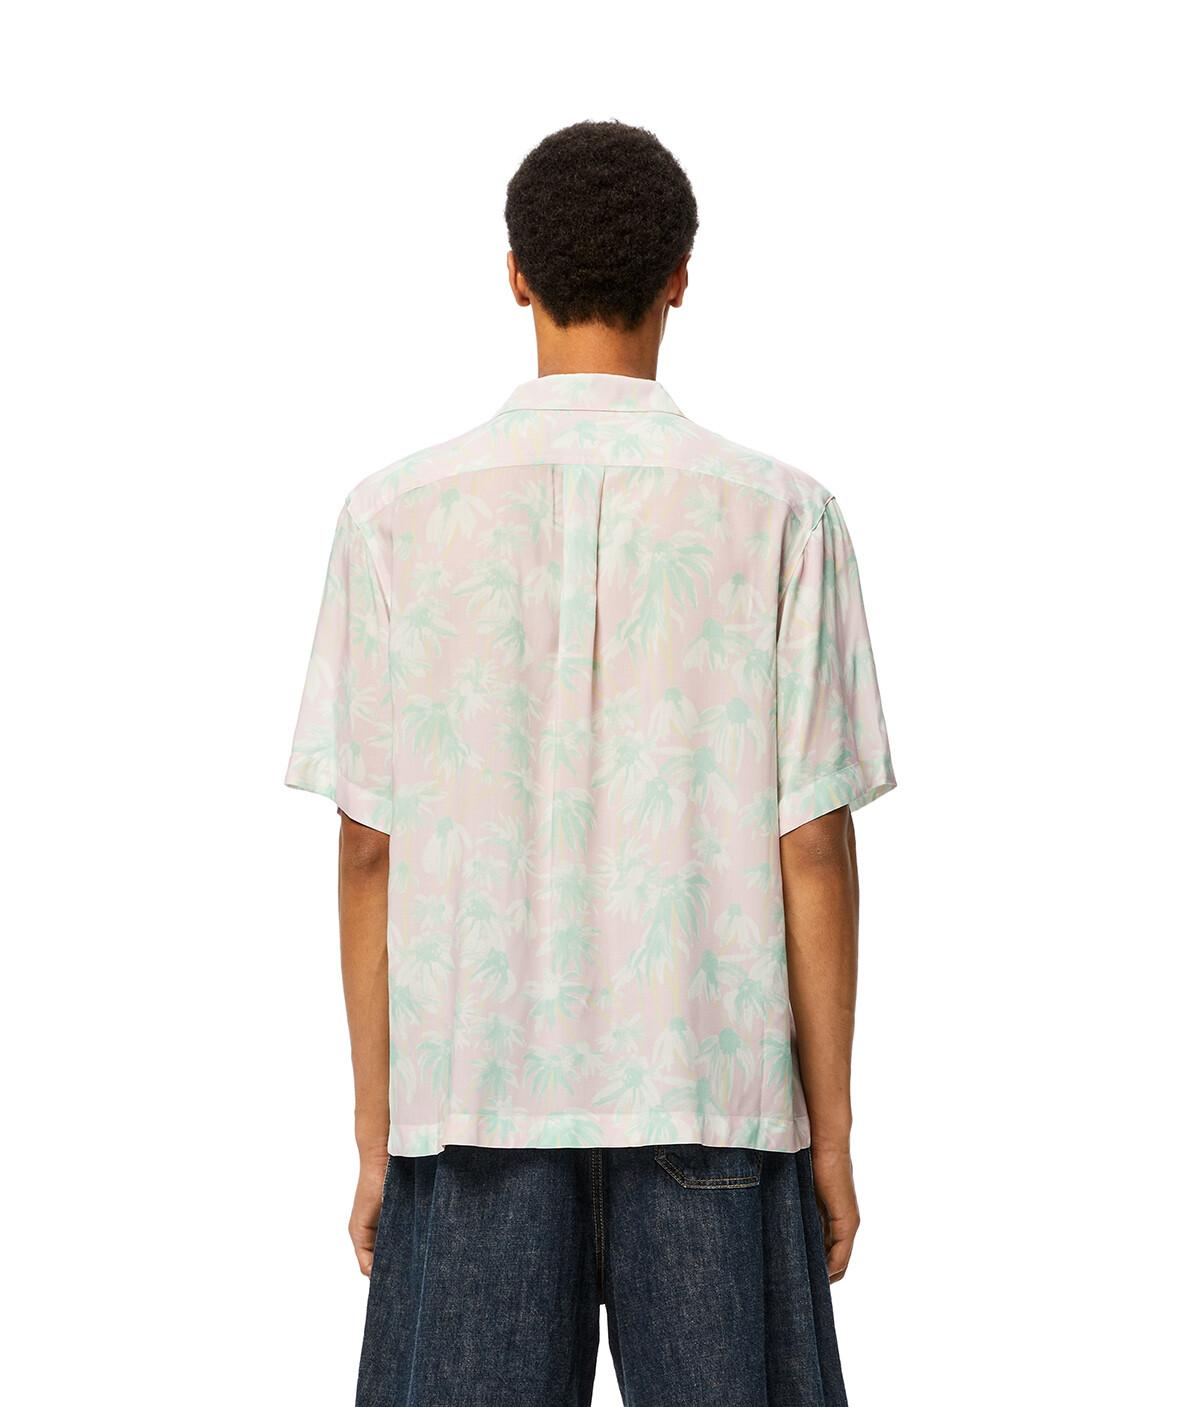 LOEWE Daisy Print Bowling Shirt Pink/Light Green front